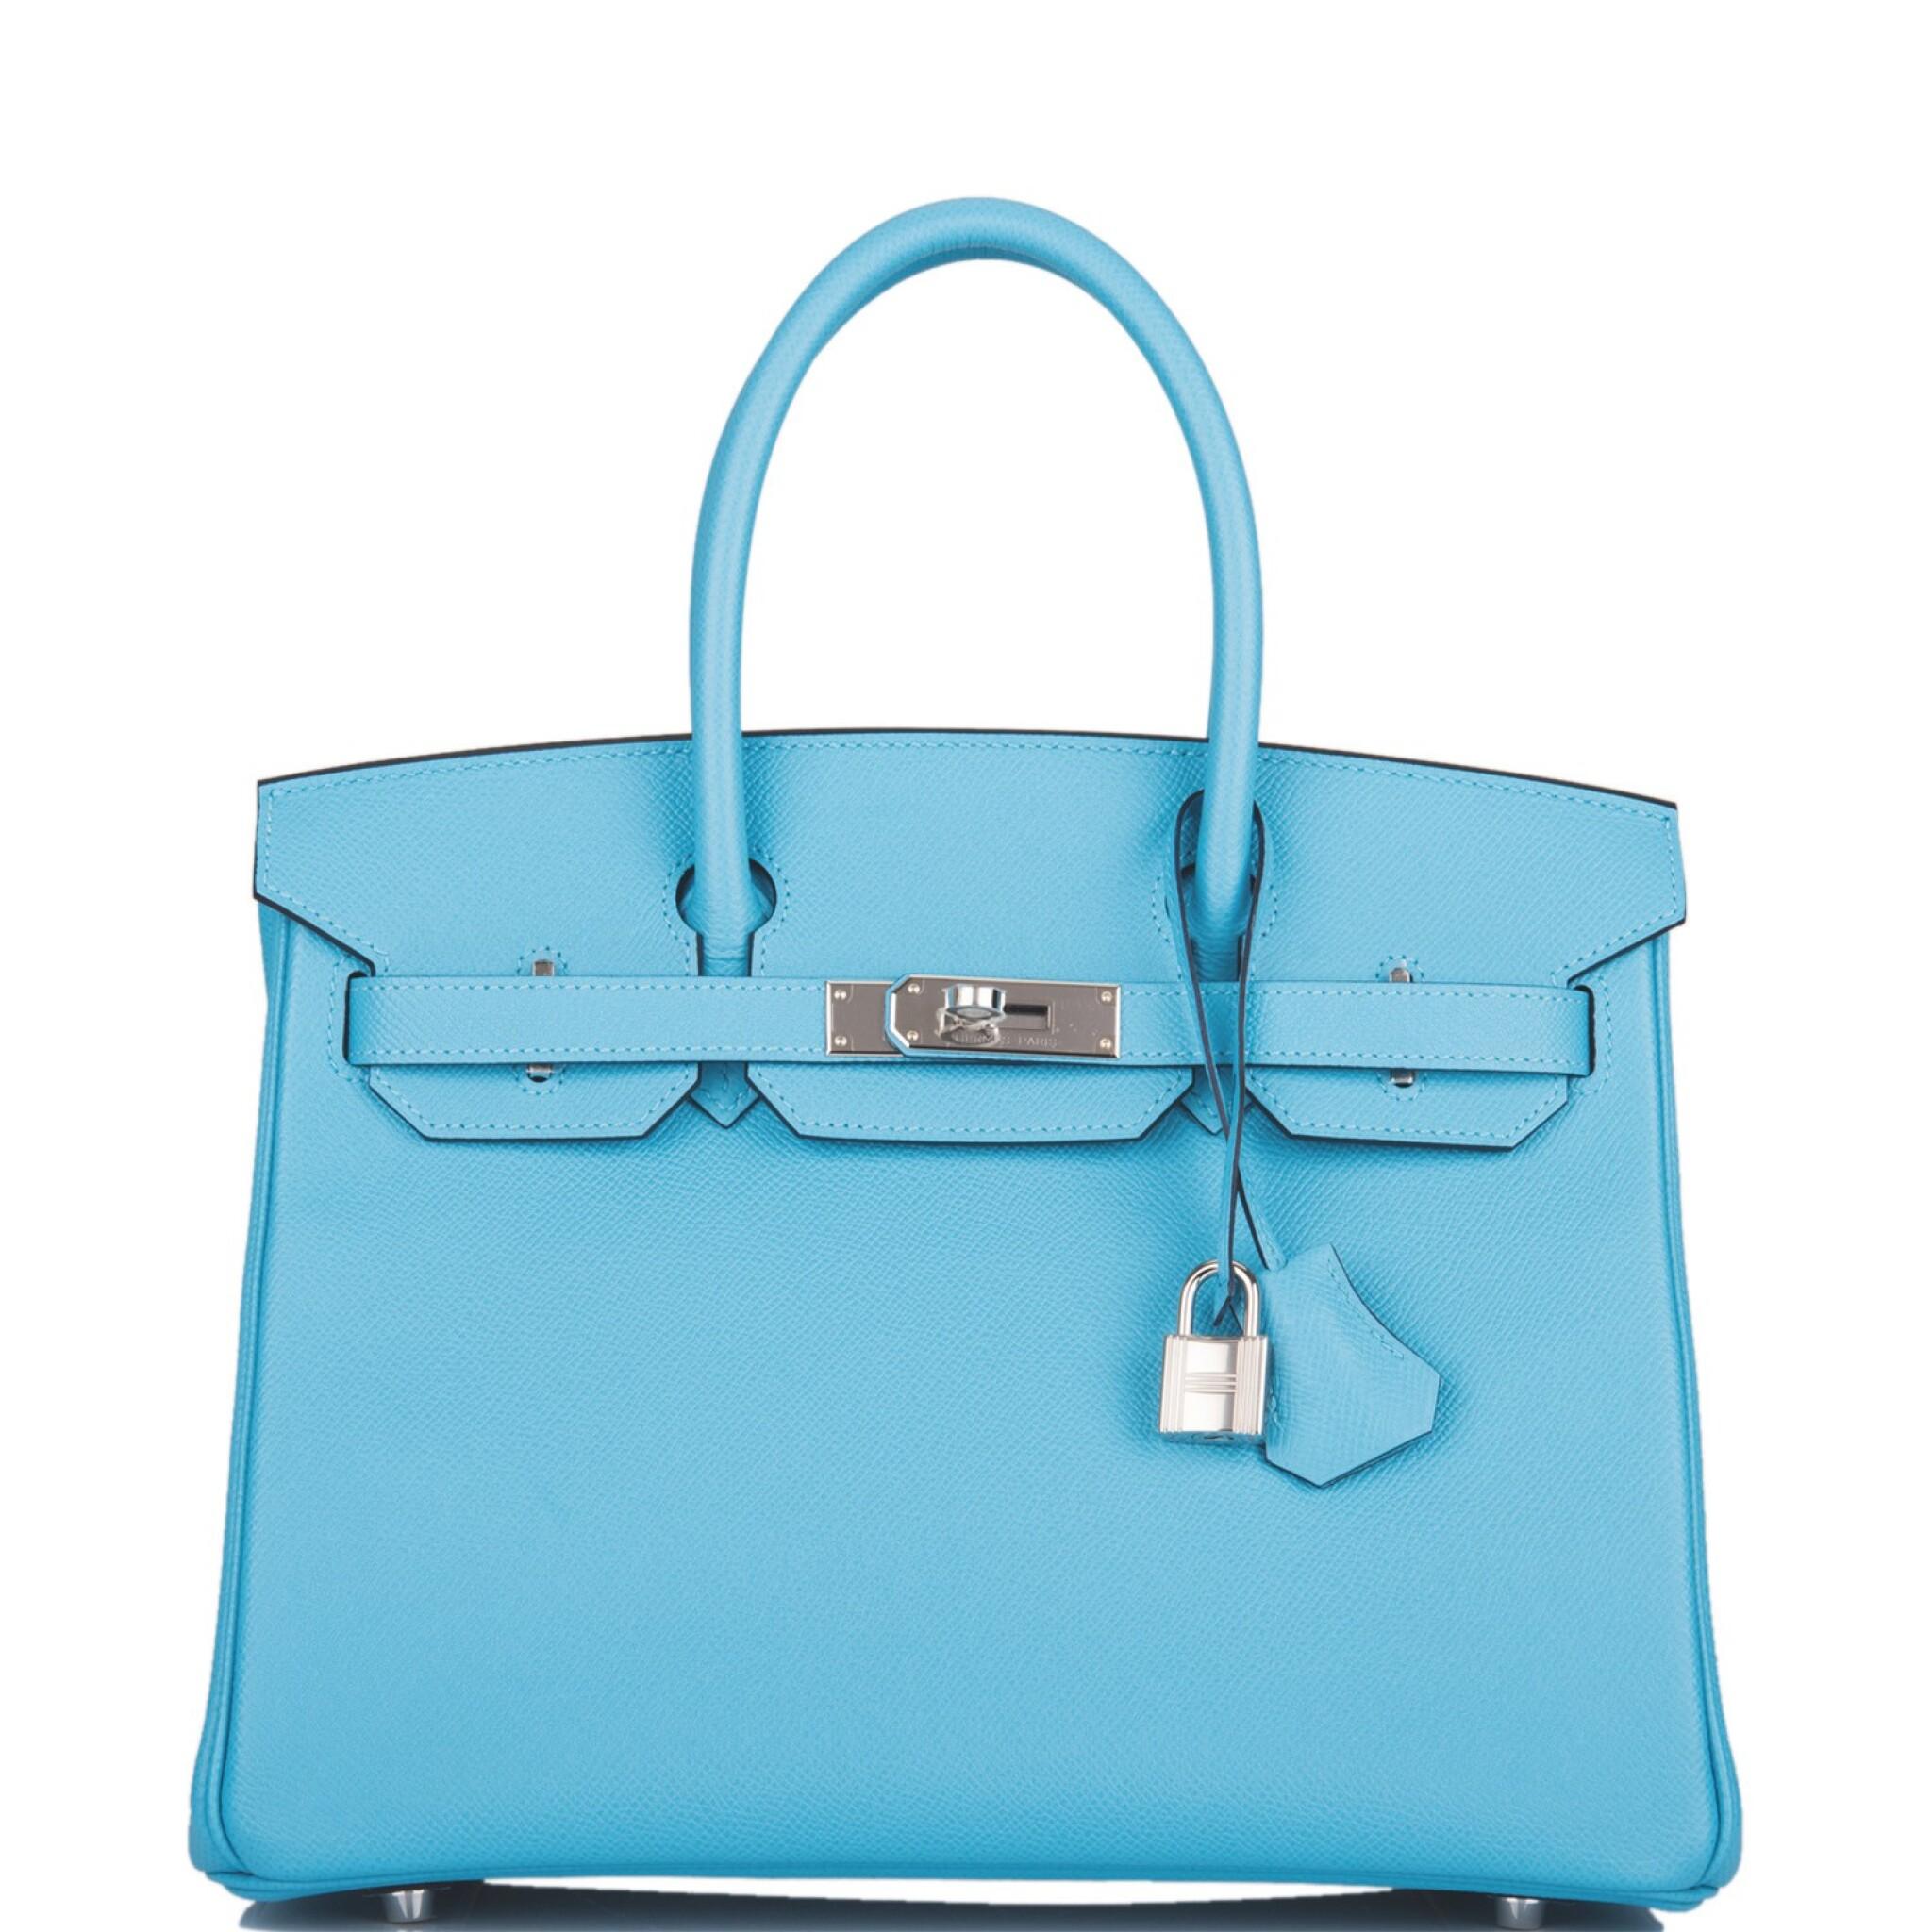 View full screen - View 1 of Lot 63. Hermès Bleu Du Nord Birkin 30cm of Epsom Leather with Palladium Hardware.